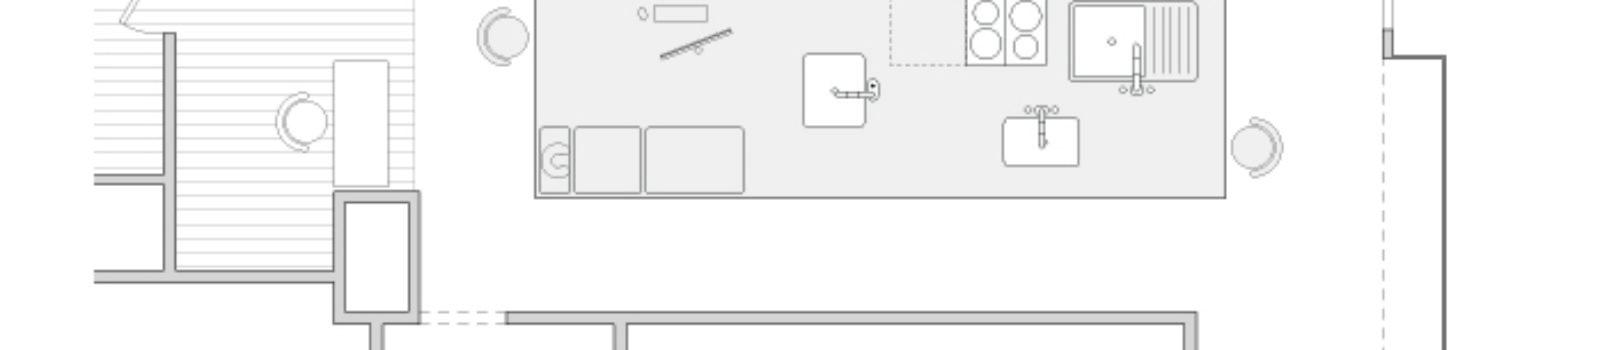 Service_Room_Plan